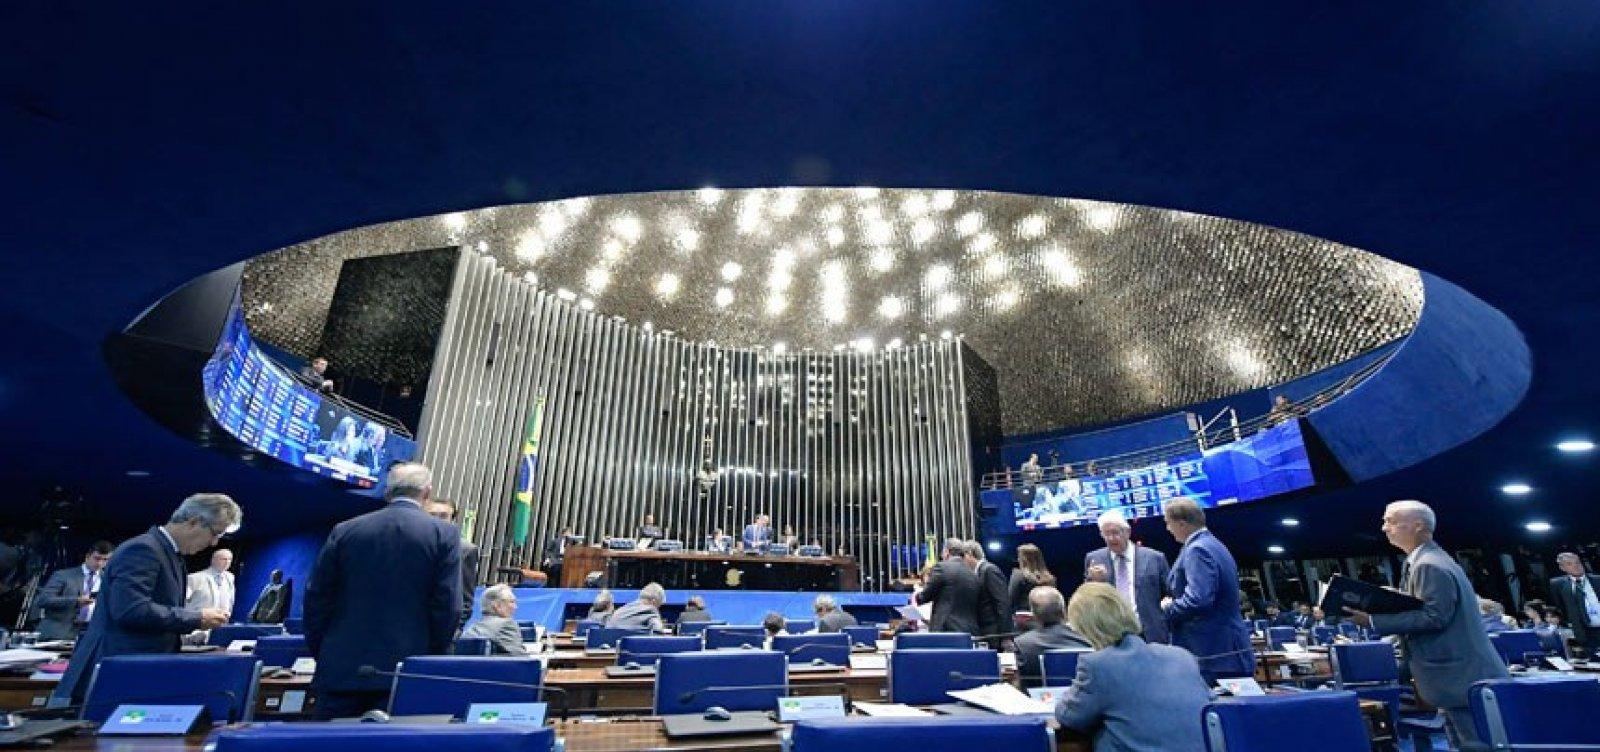 Senado define integrantes da nova Mesa Diretora; confira